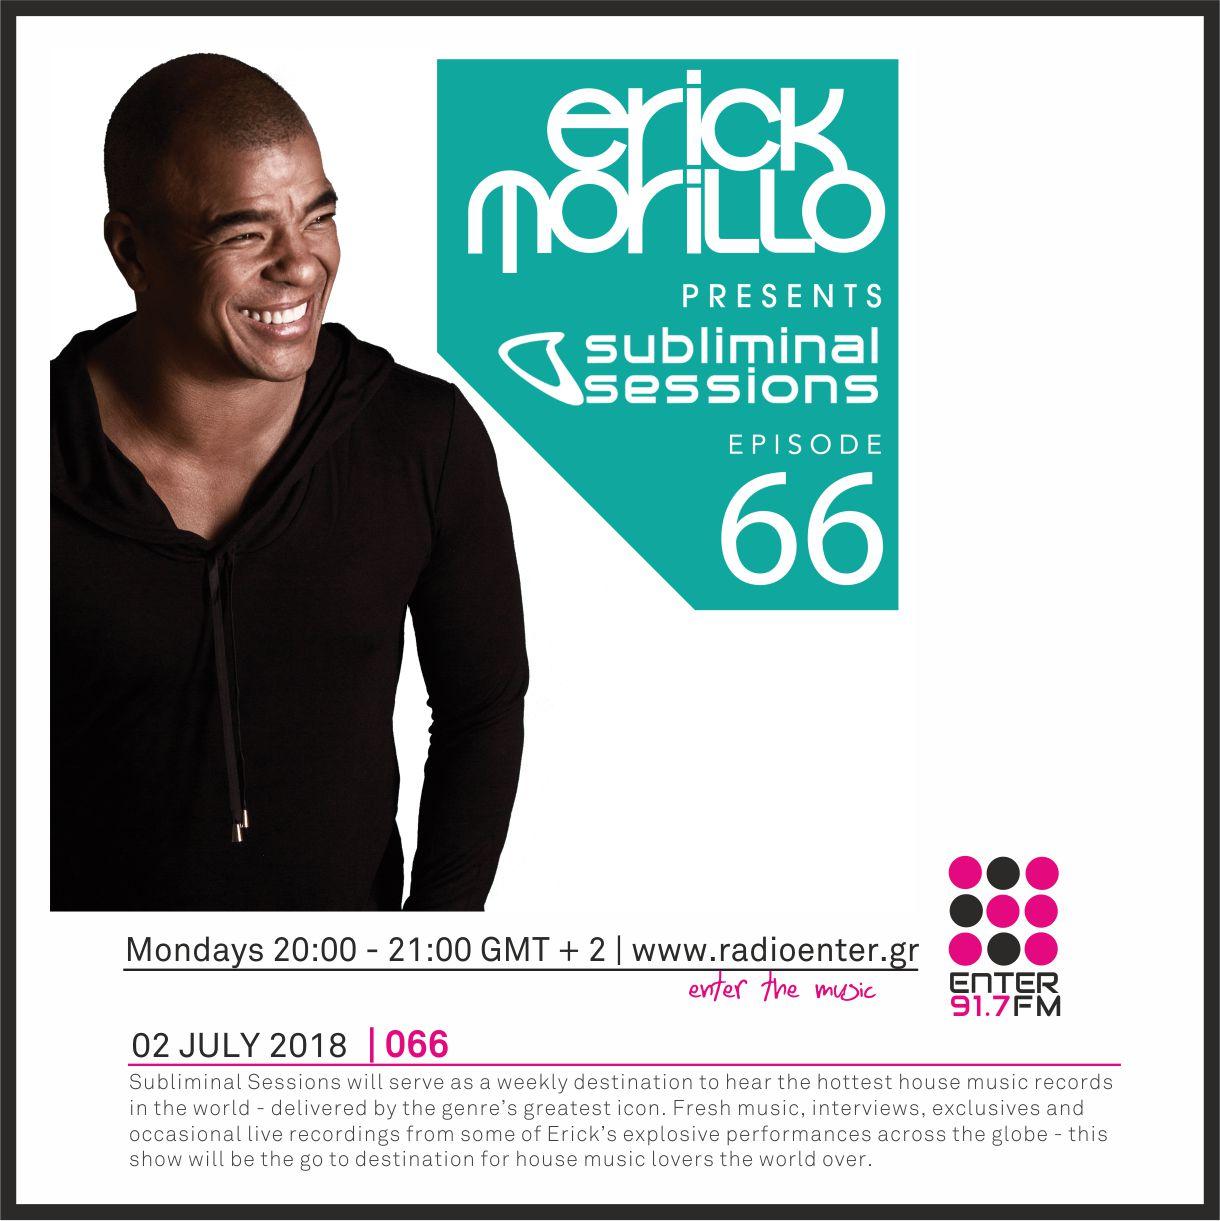 2018.07.02 - Erick Morillo 'Subliminal Sessions' 066